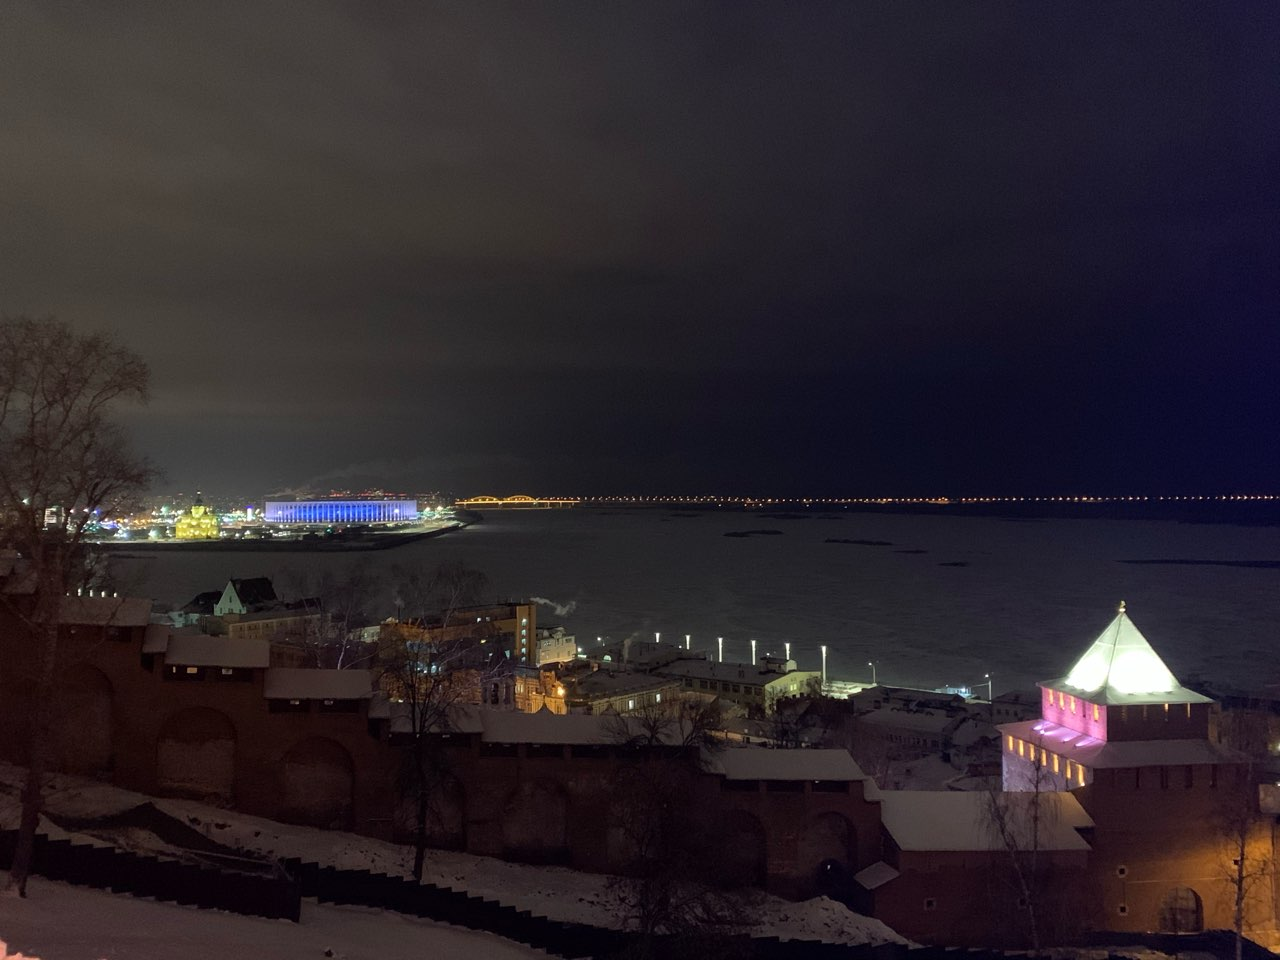 «Нижнему Новгороду нужен мастер-план по подсветке» - Роман Улитин